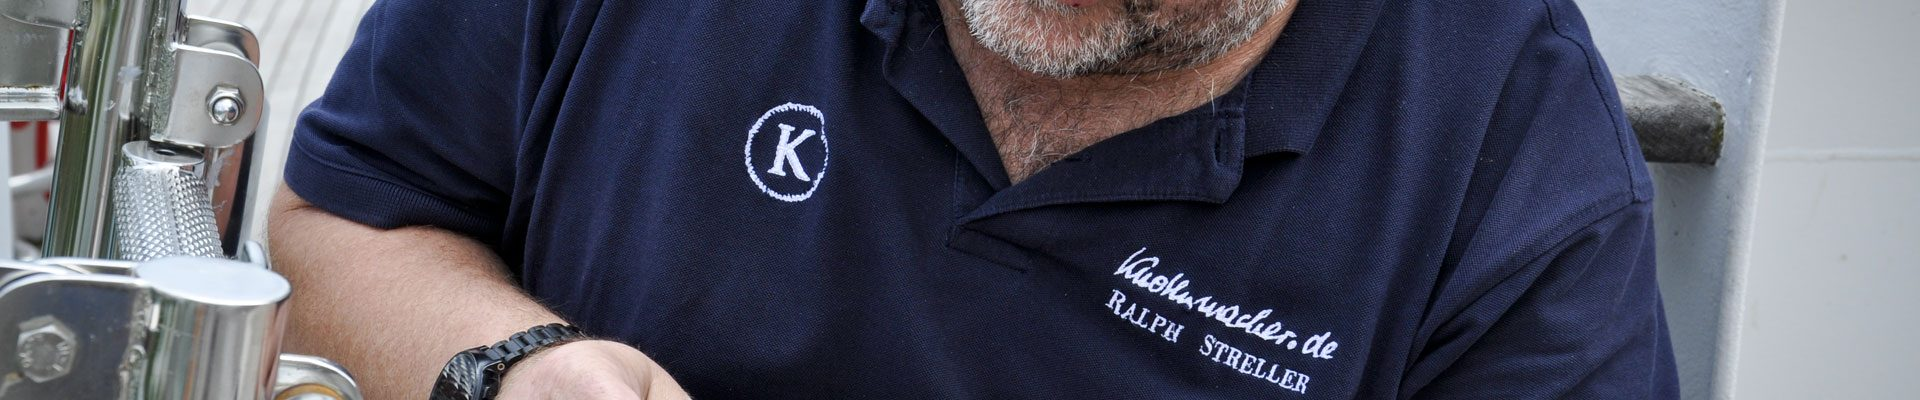 Der Knotenmacher Ralph Streller besucht den Rollisegler